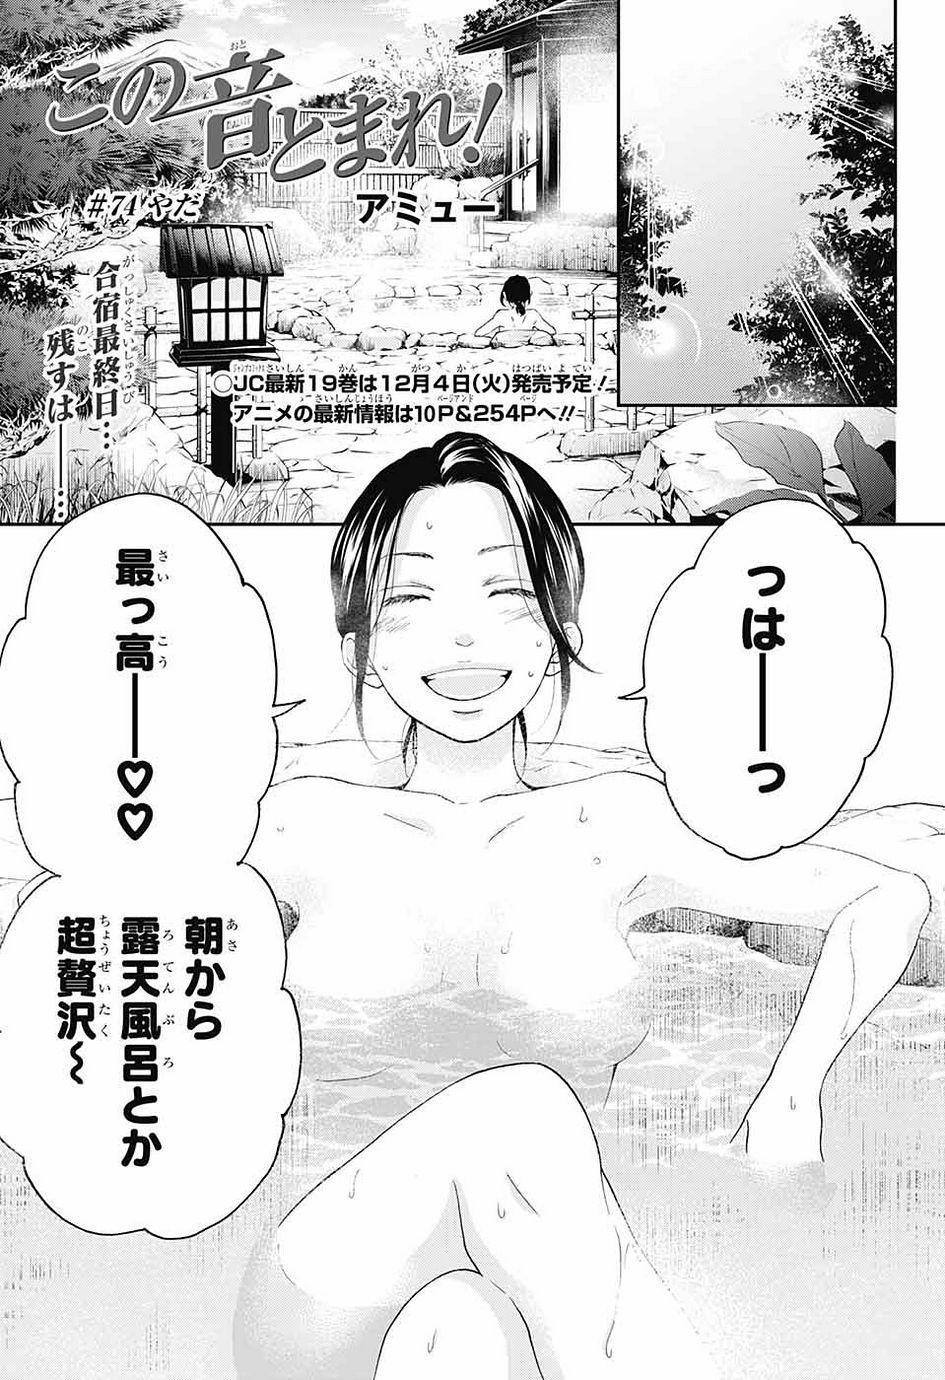 Kono Oto Tomare! - Chapter 074 - Page 1